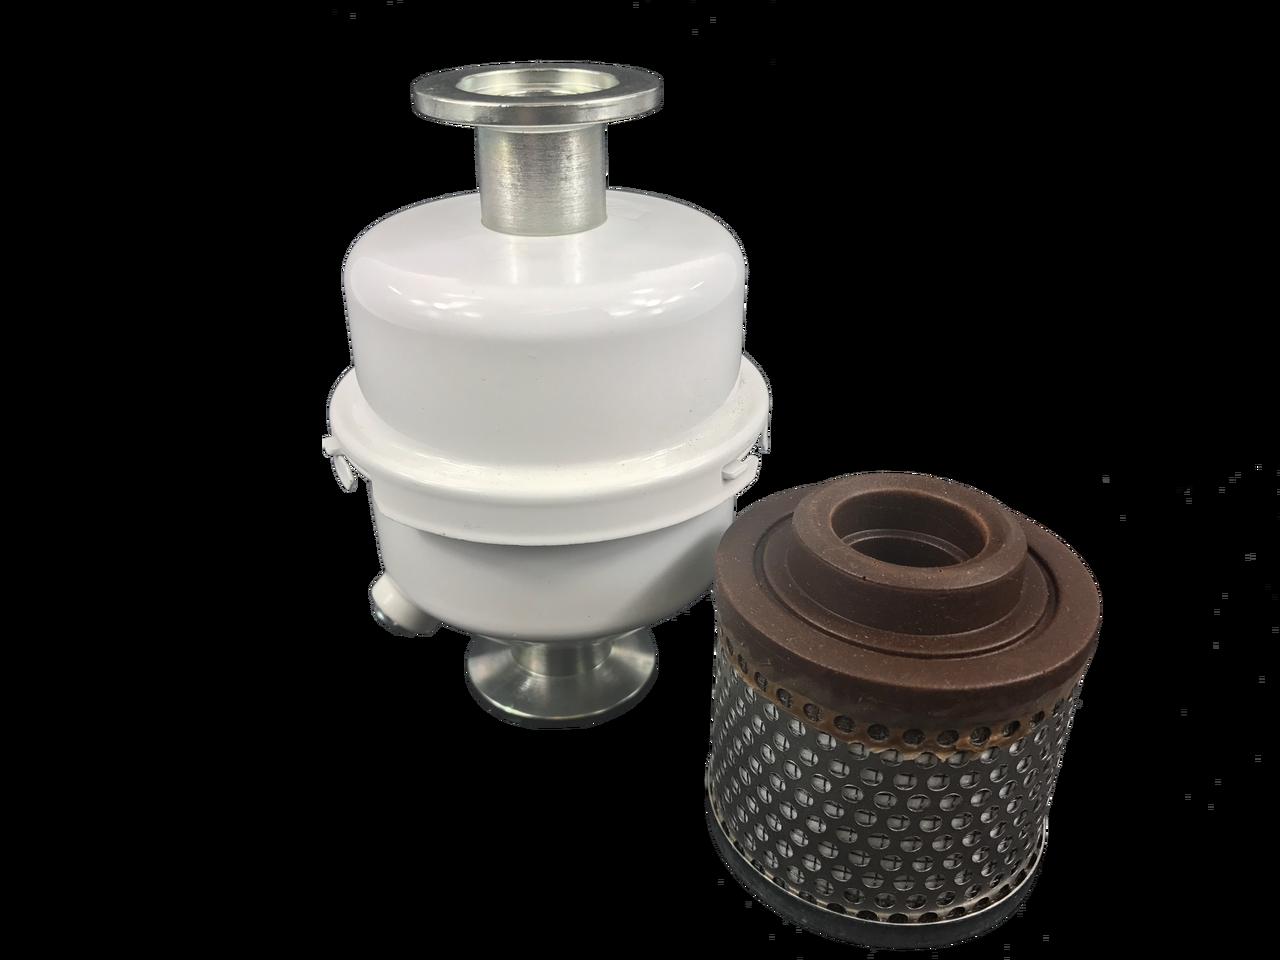 10 CFM High Capacity Oil Mist Eliminator *Filter Cartridge Included